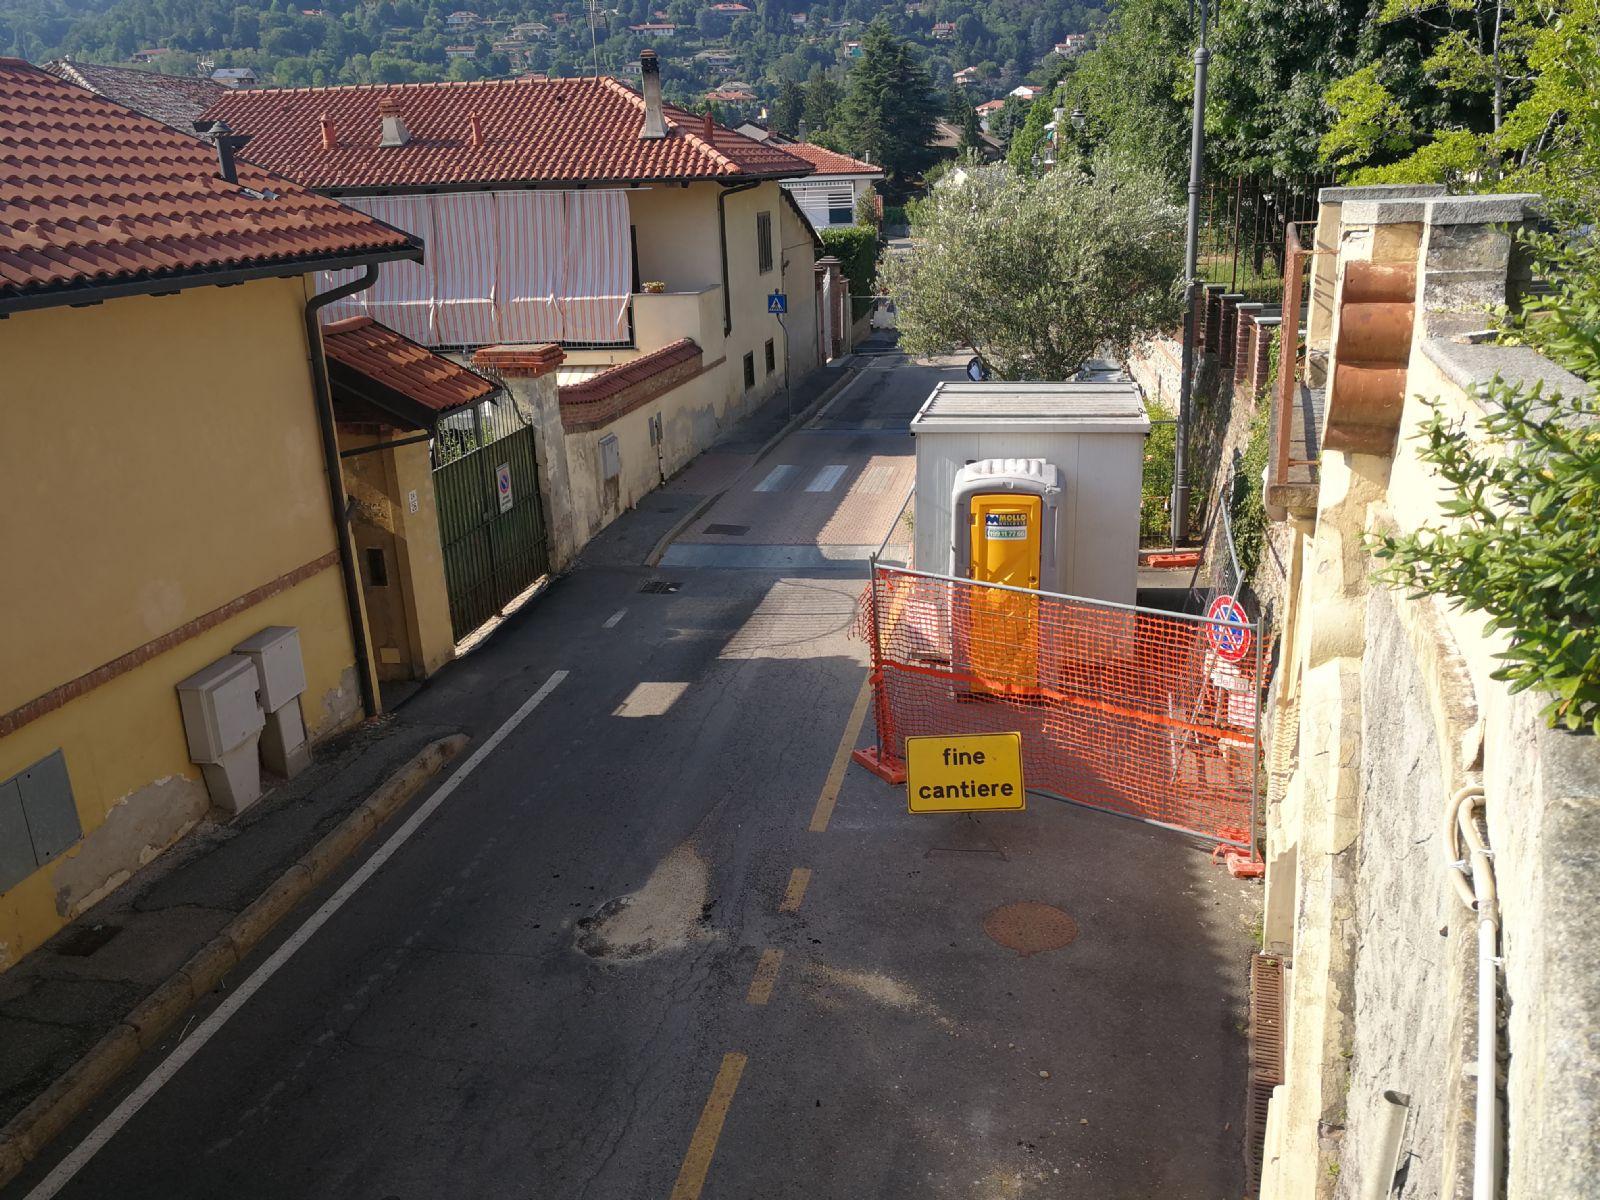 Comune Di Pecetto Torinese chiusura via umberto i - comune di pecetto torinese